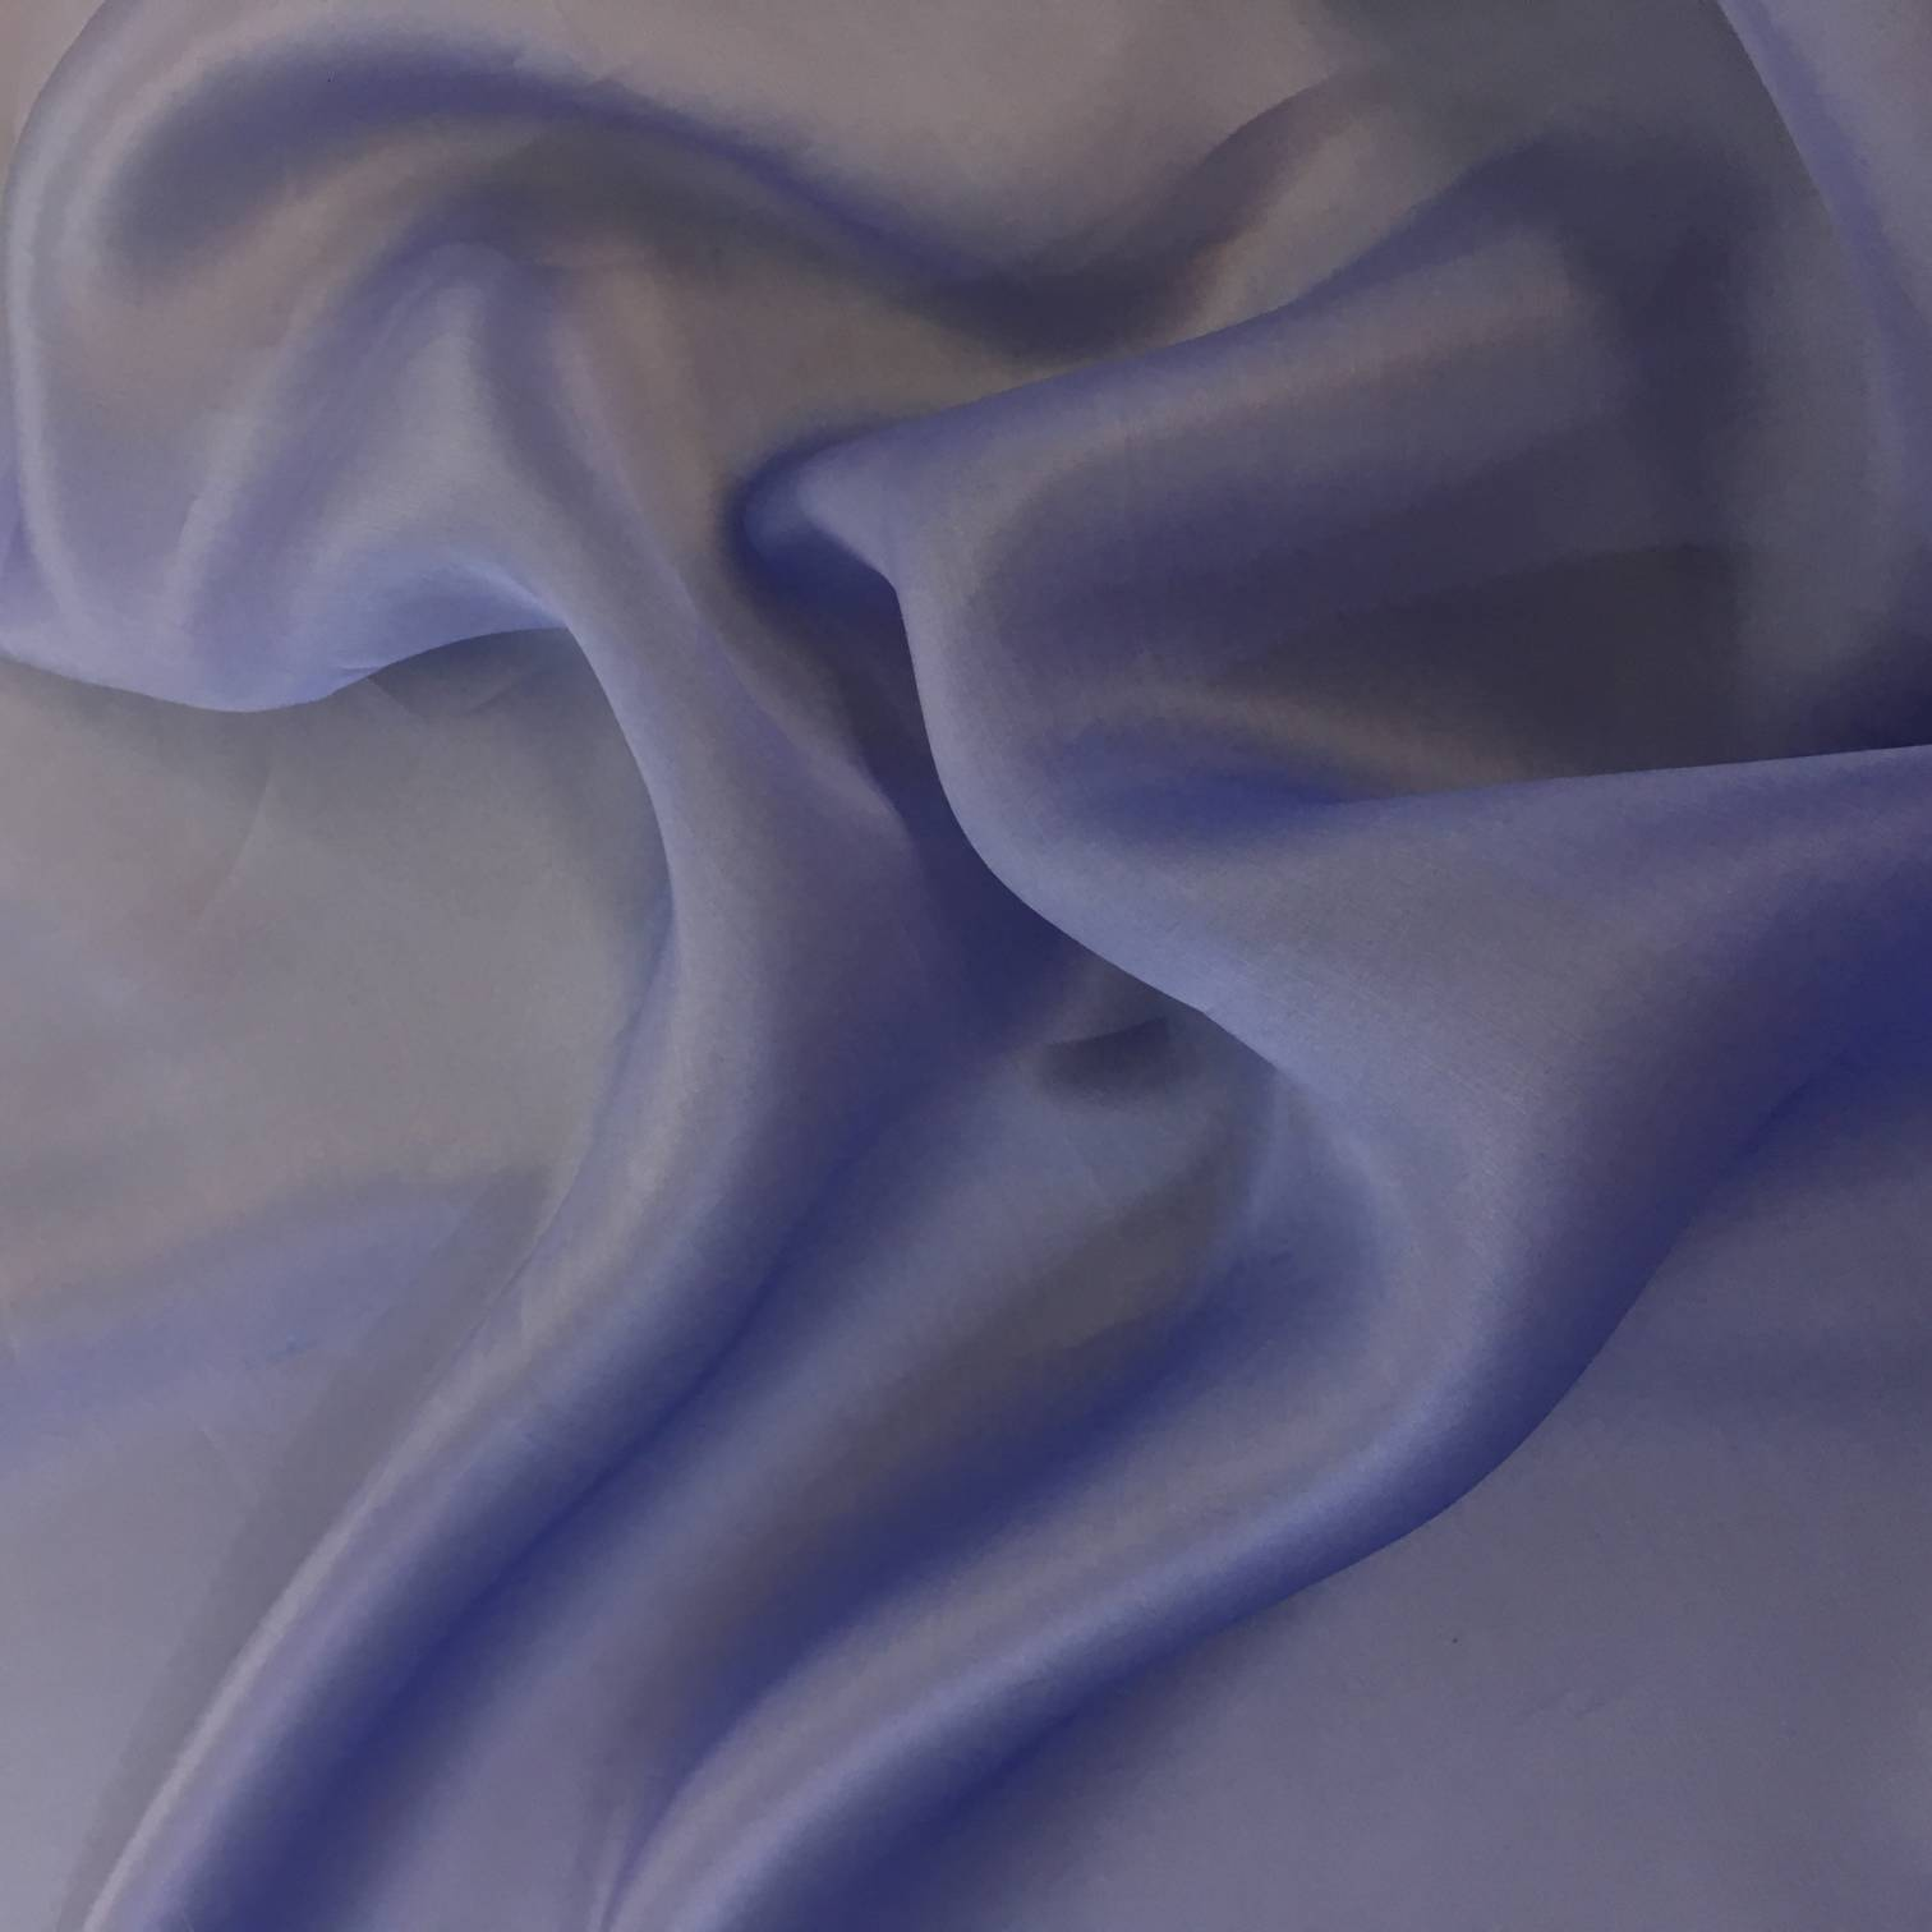 74bc9847054 Gazar de Seda Pura Lilás Hortência – Pannus Tecidos